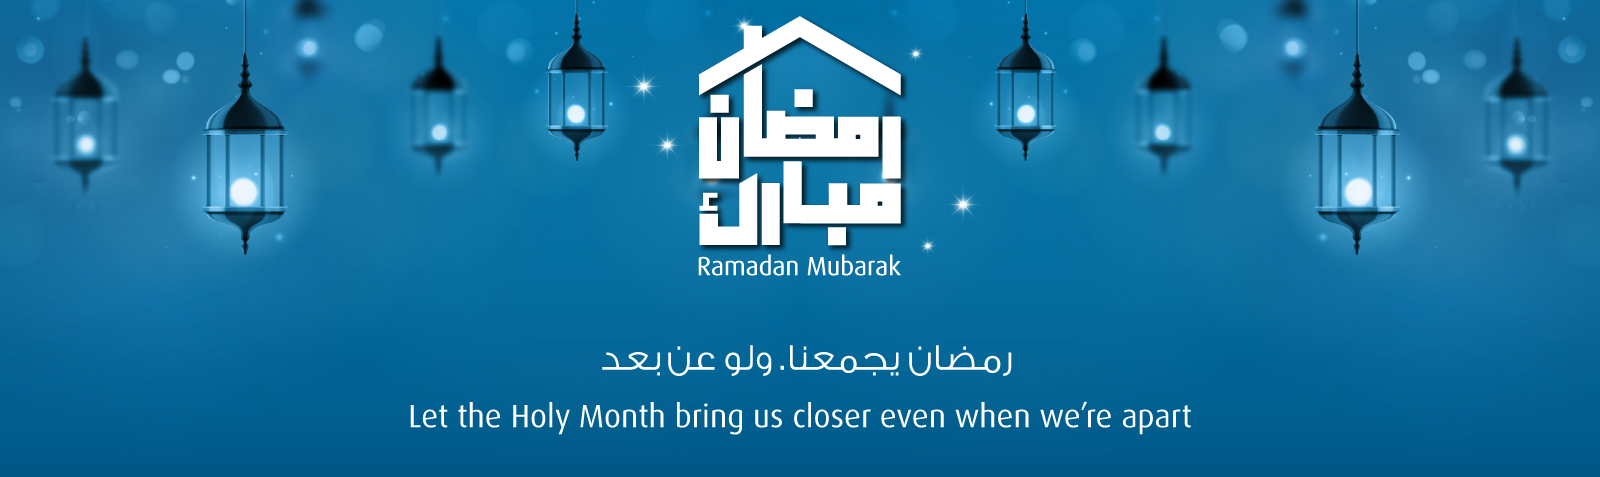 en-ramadantiming